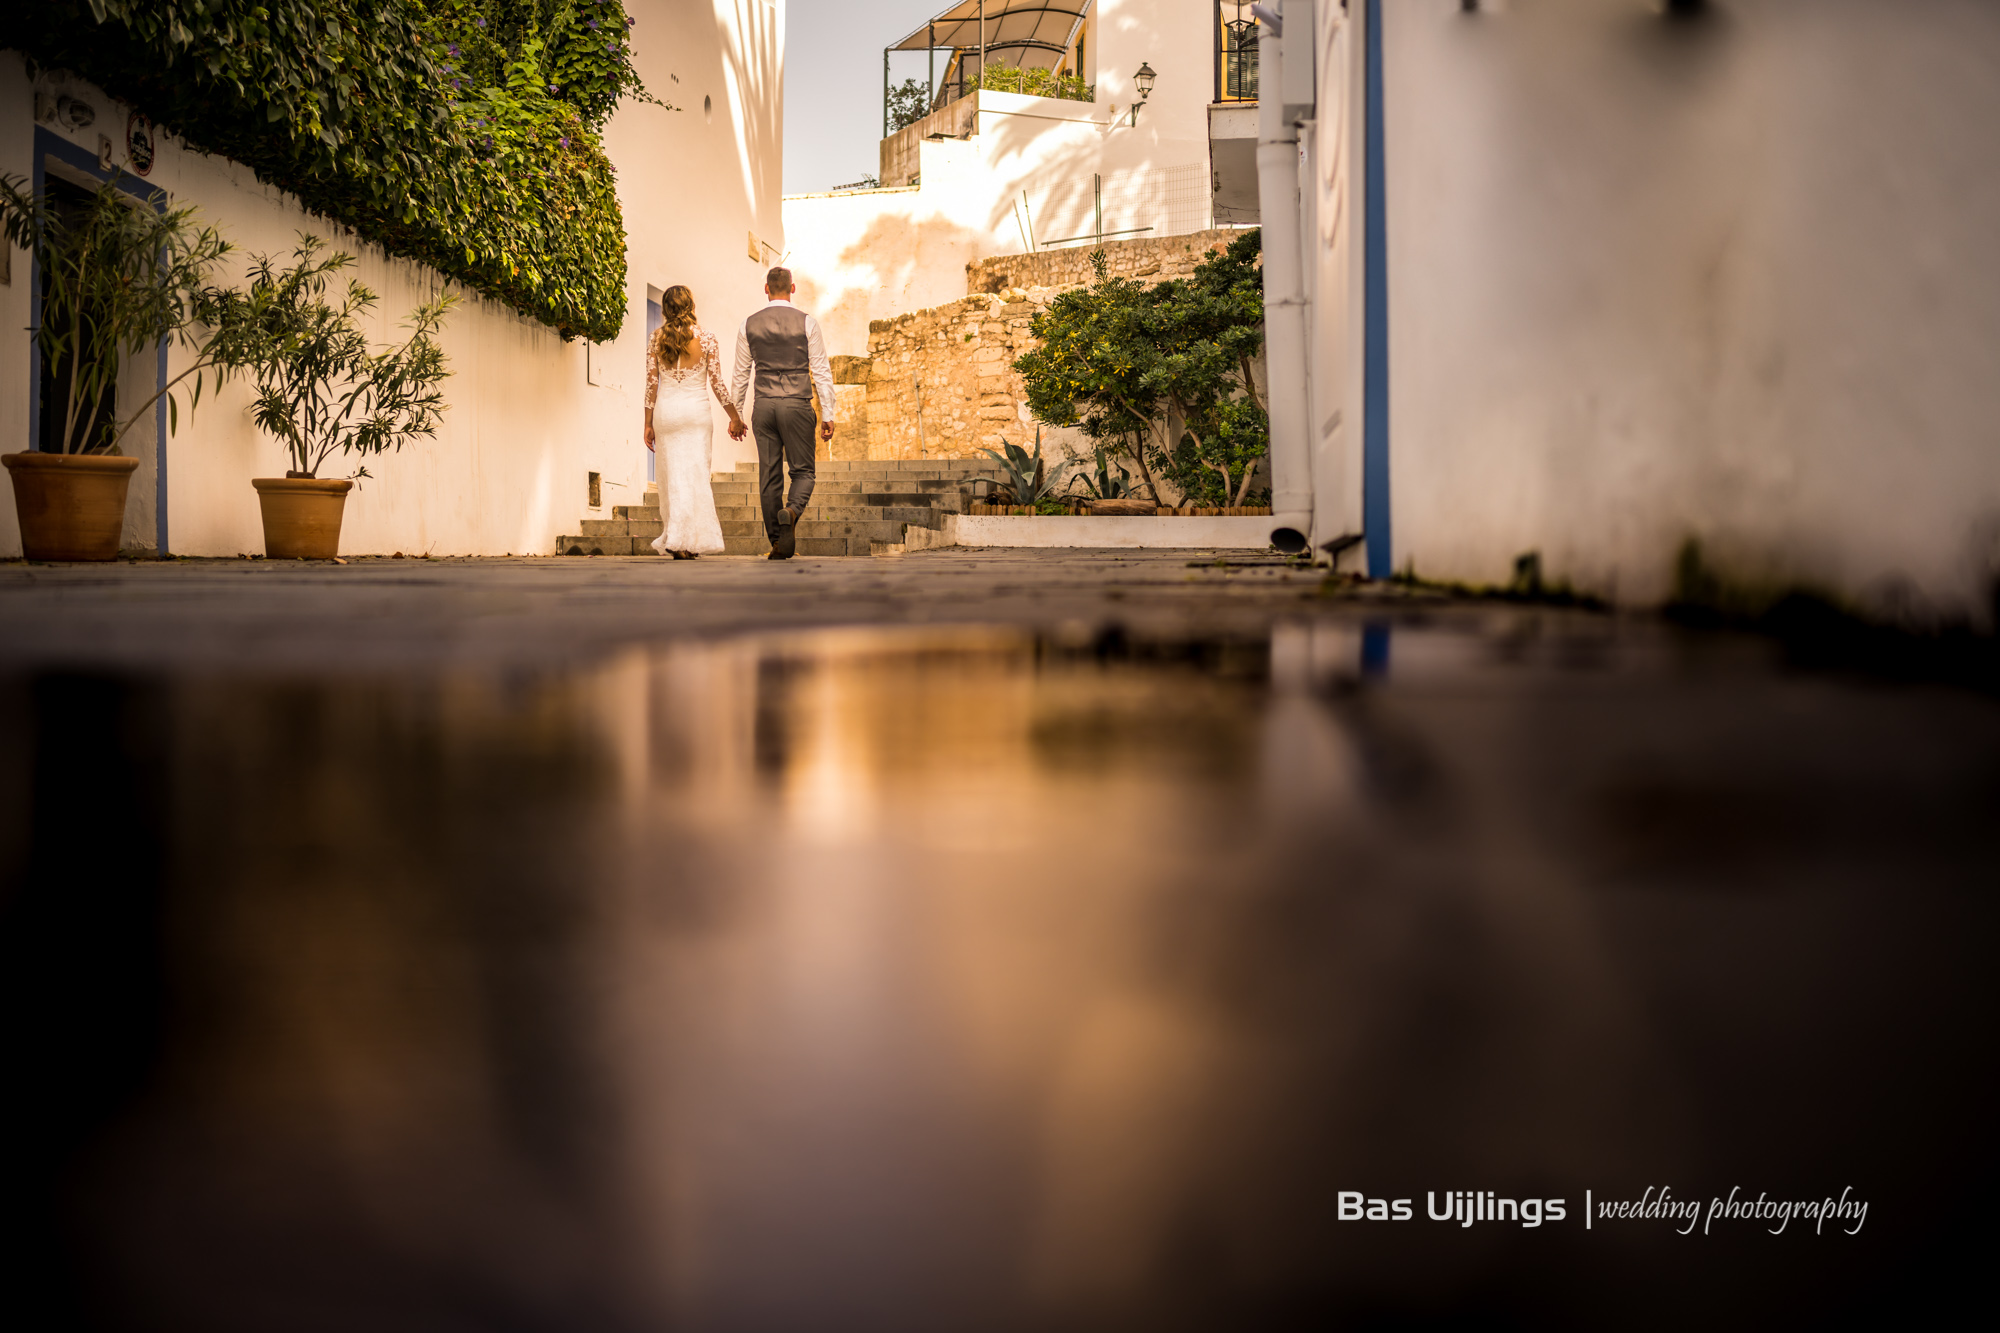 6 Bas Uijlings photography - L079.jpg